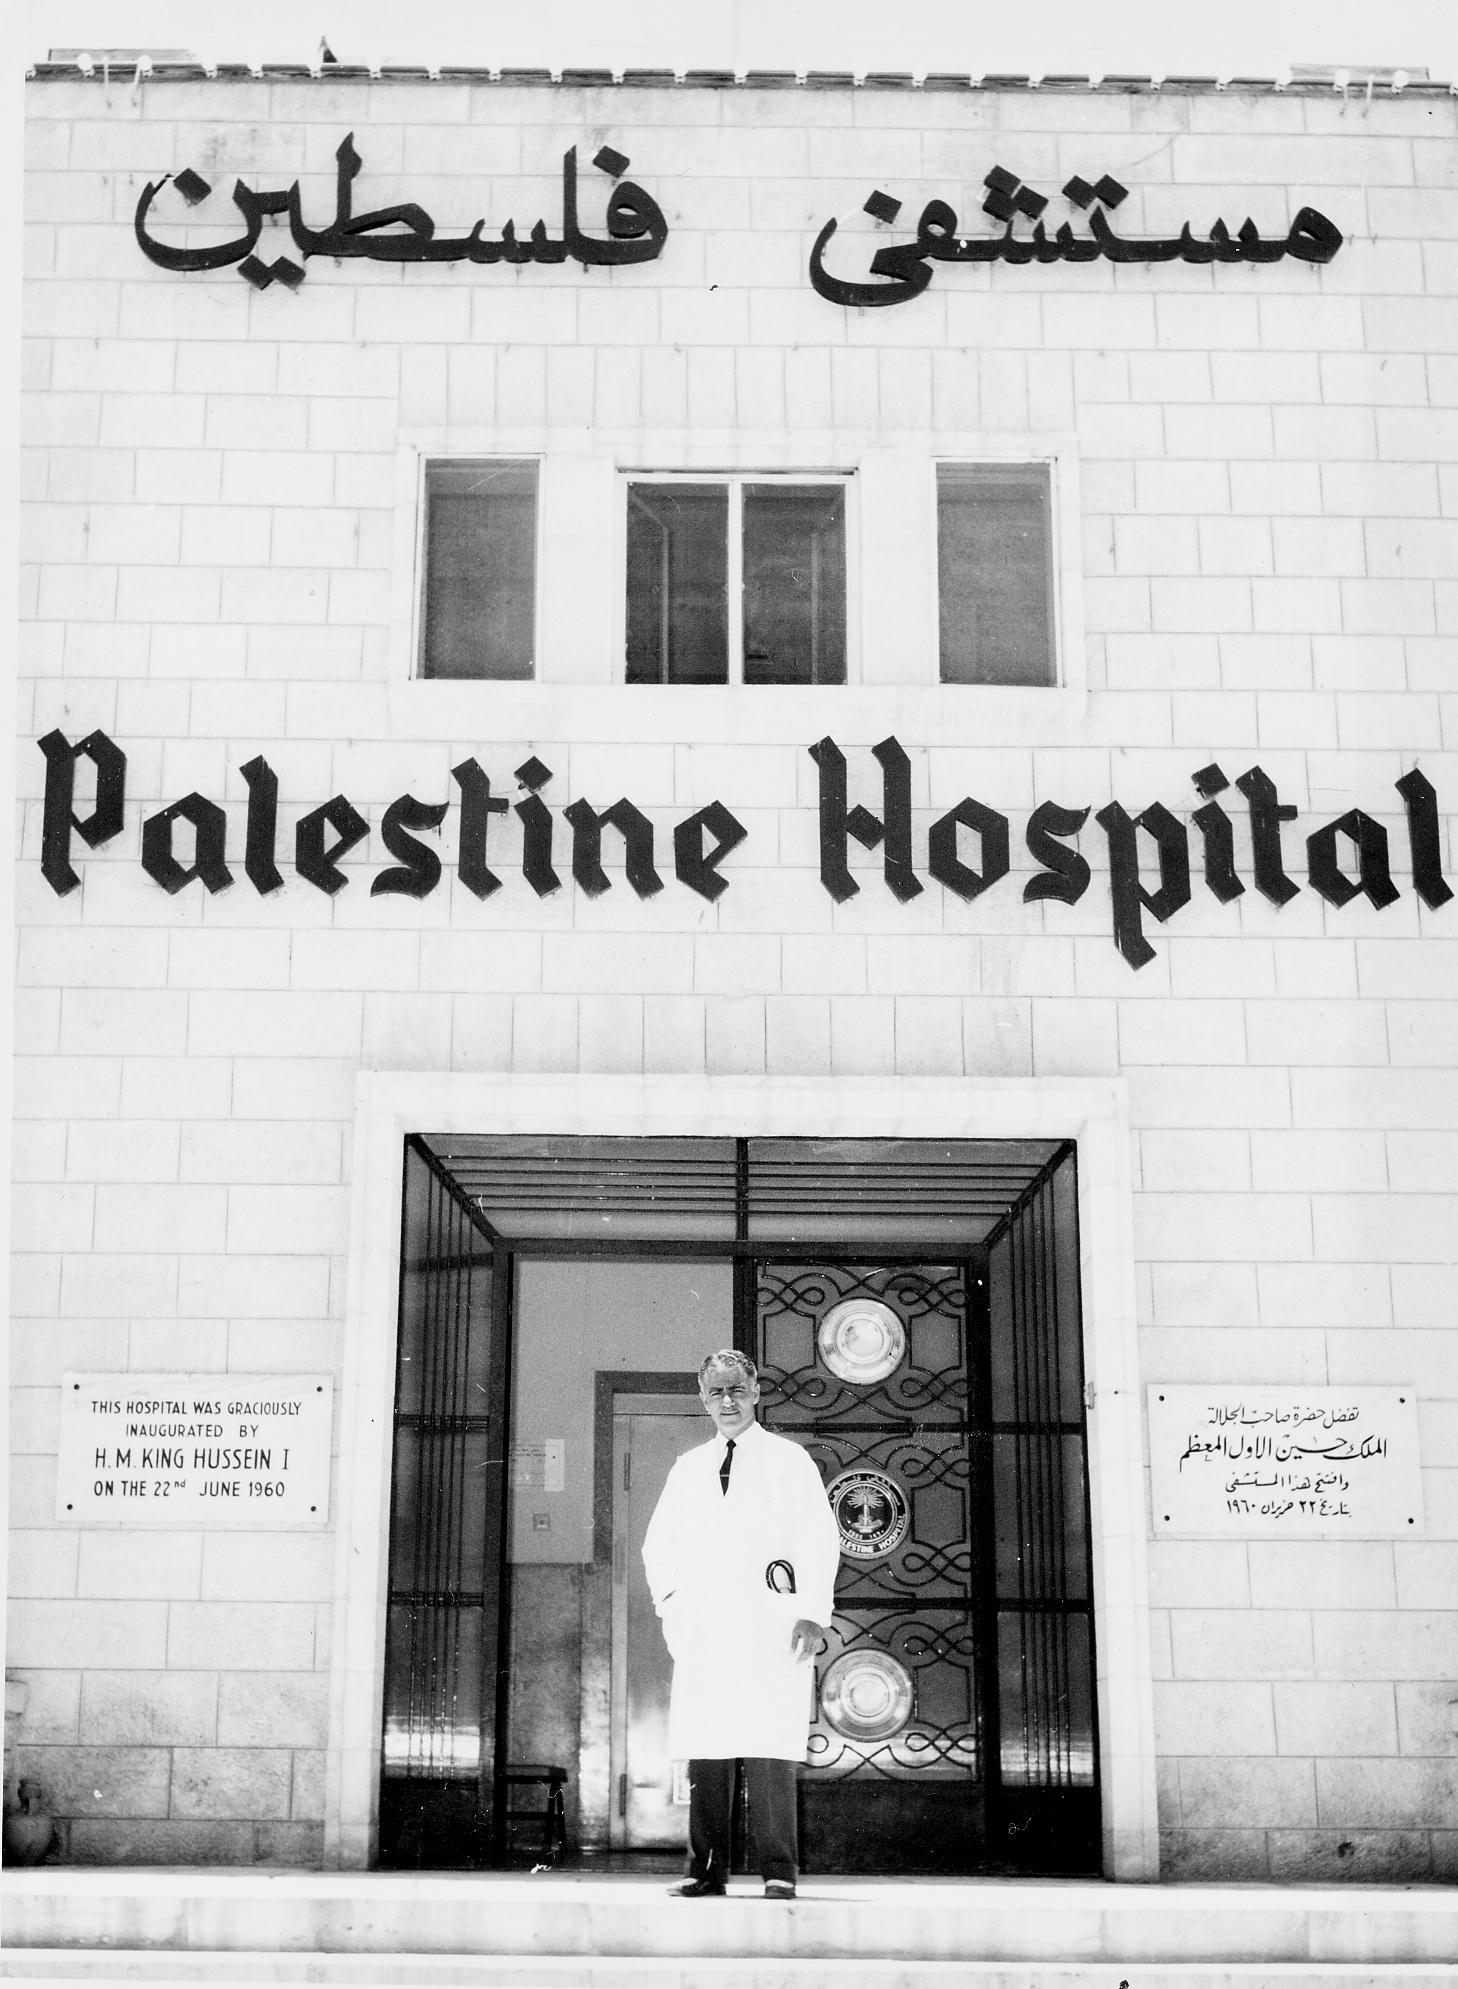 Dr. Sami Khoury in front of private Palestine Hospital in 1960 Amman Jordan